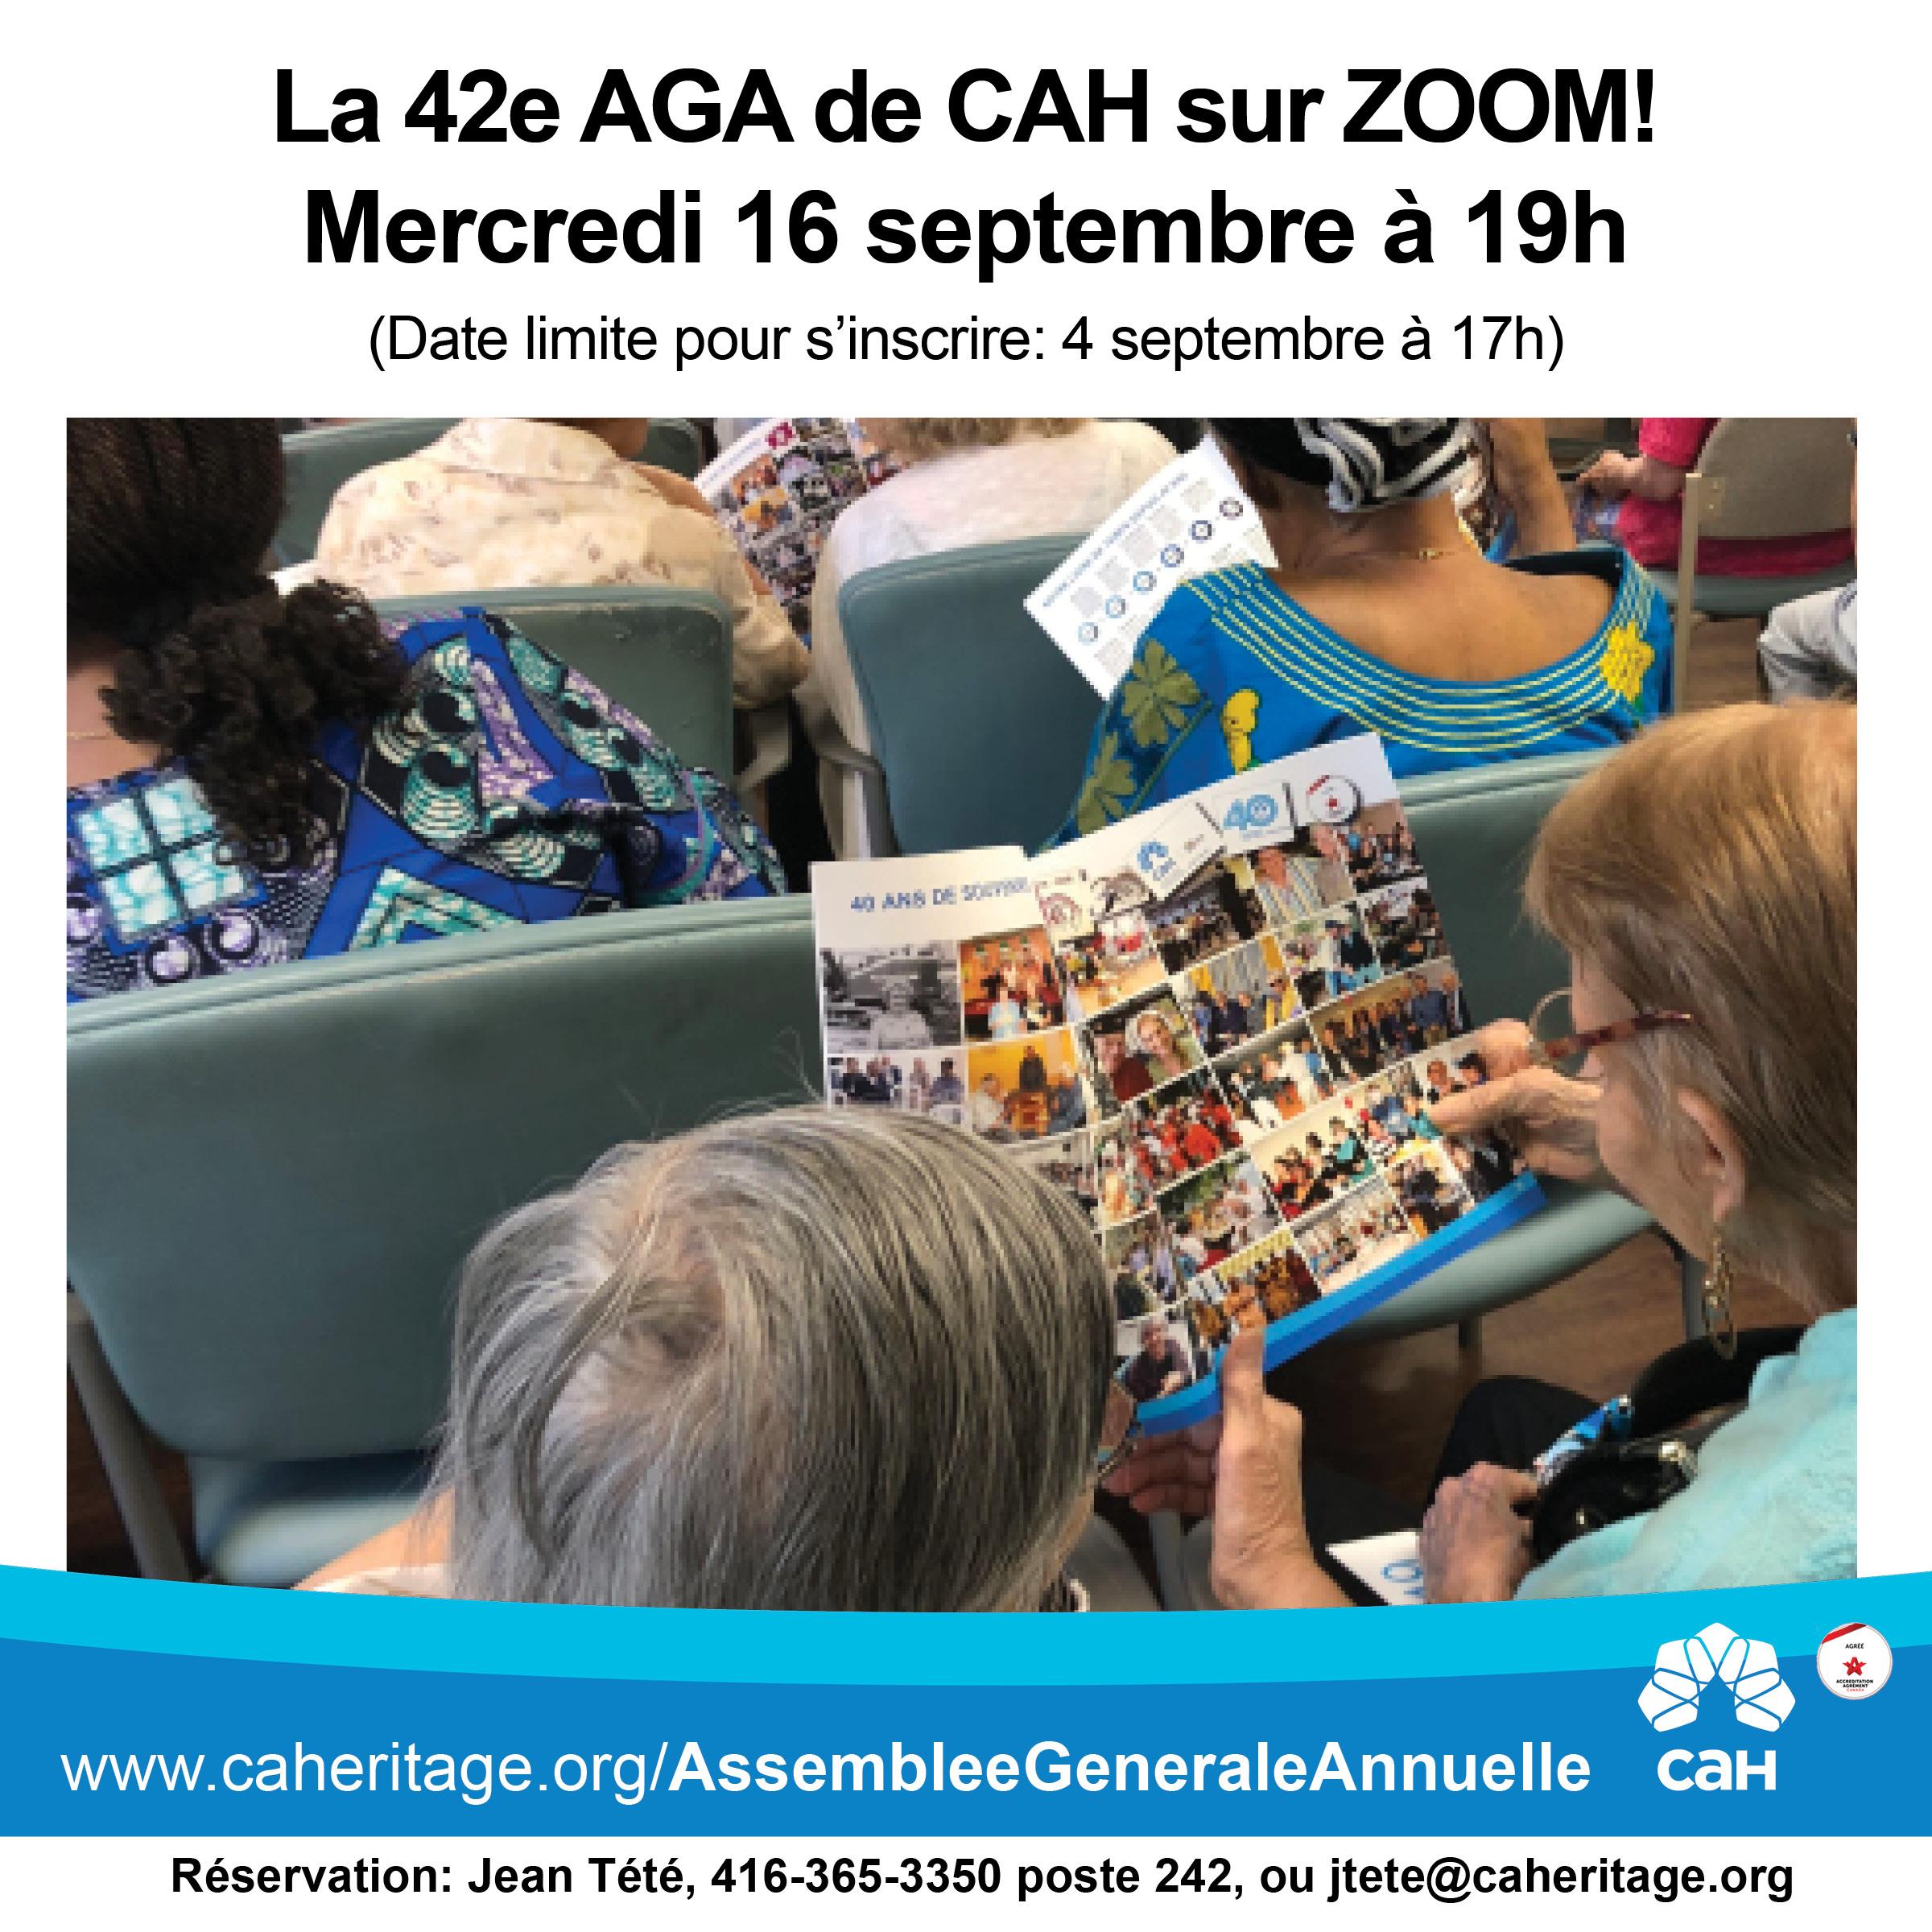 Assemblée générale annuelle (AGA)